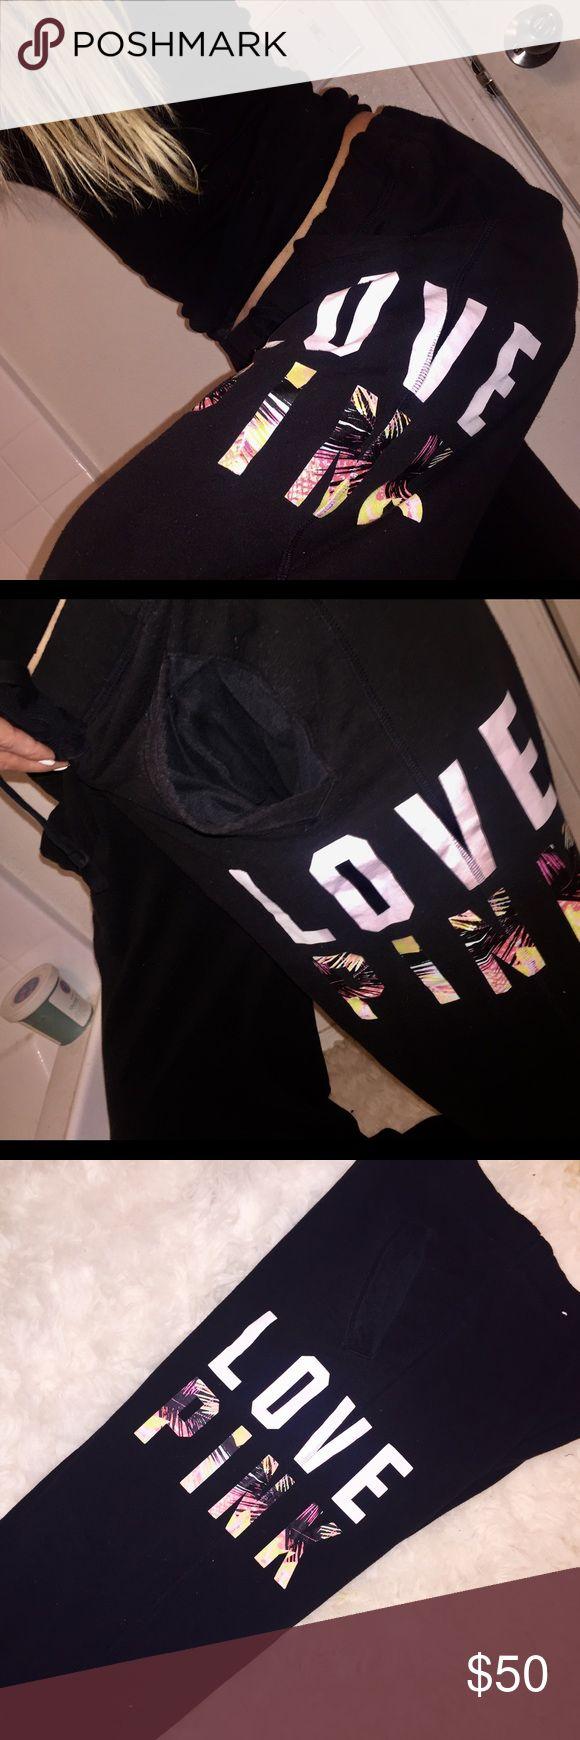 🌴 Victoria Secret Pink Tropical Pants 🌴 Victoria Secret Pink Tropical SweatPants. Size small. Black with logo on the left leg. Perfect new condition. Size small. PINK Victoria's Secret Pants Track Pants & Joggers